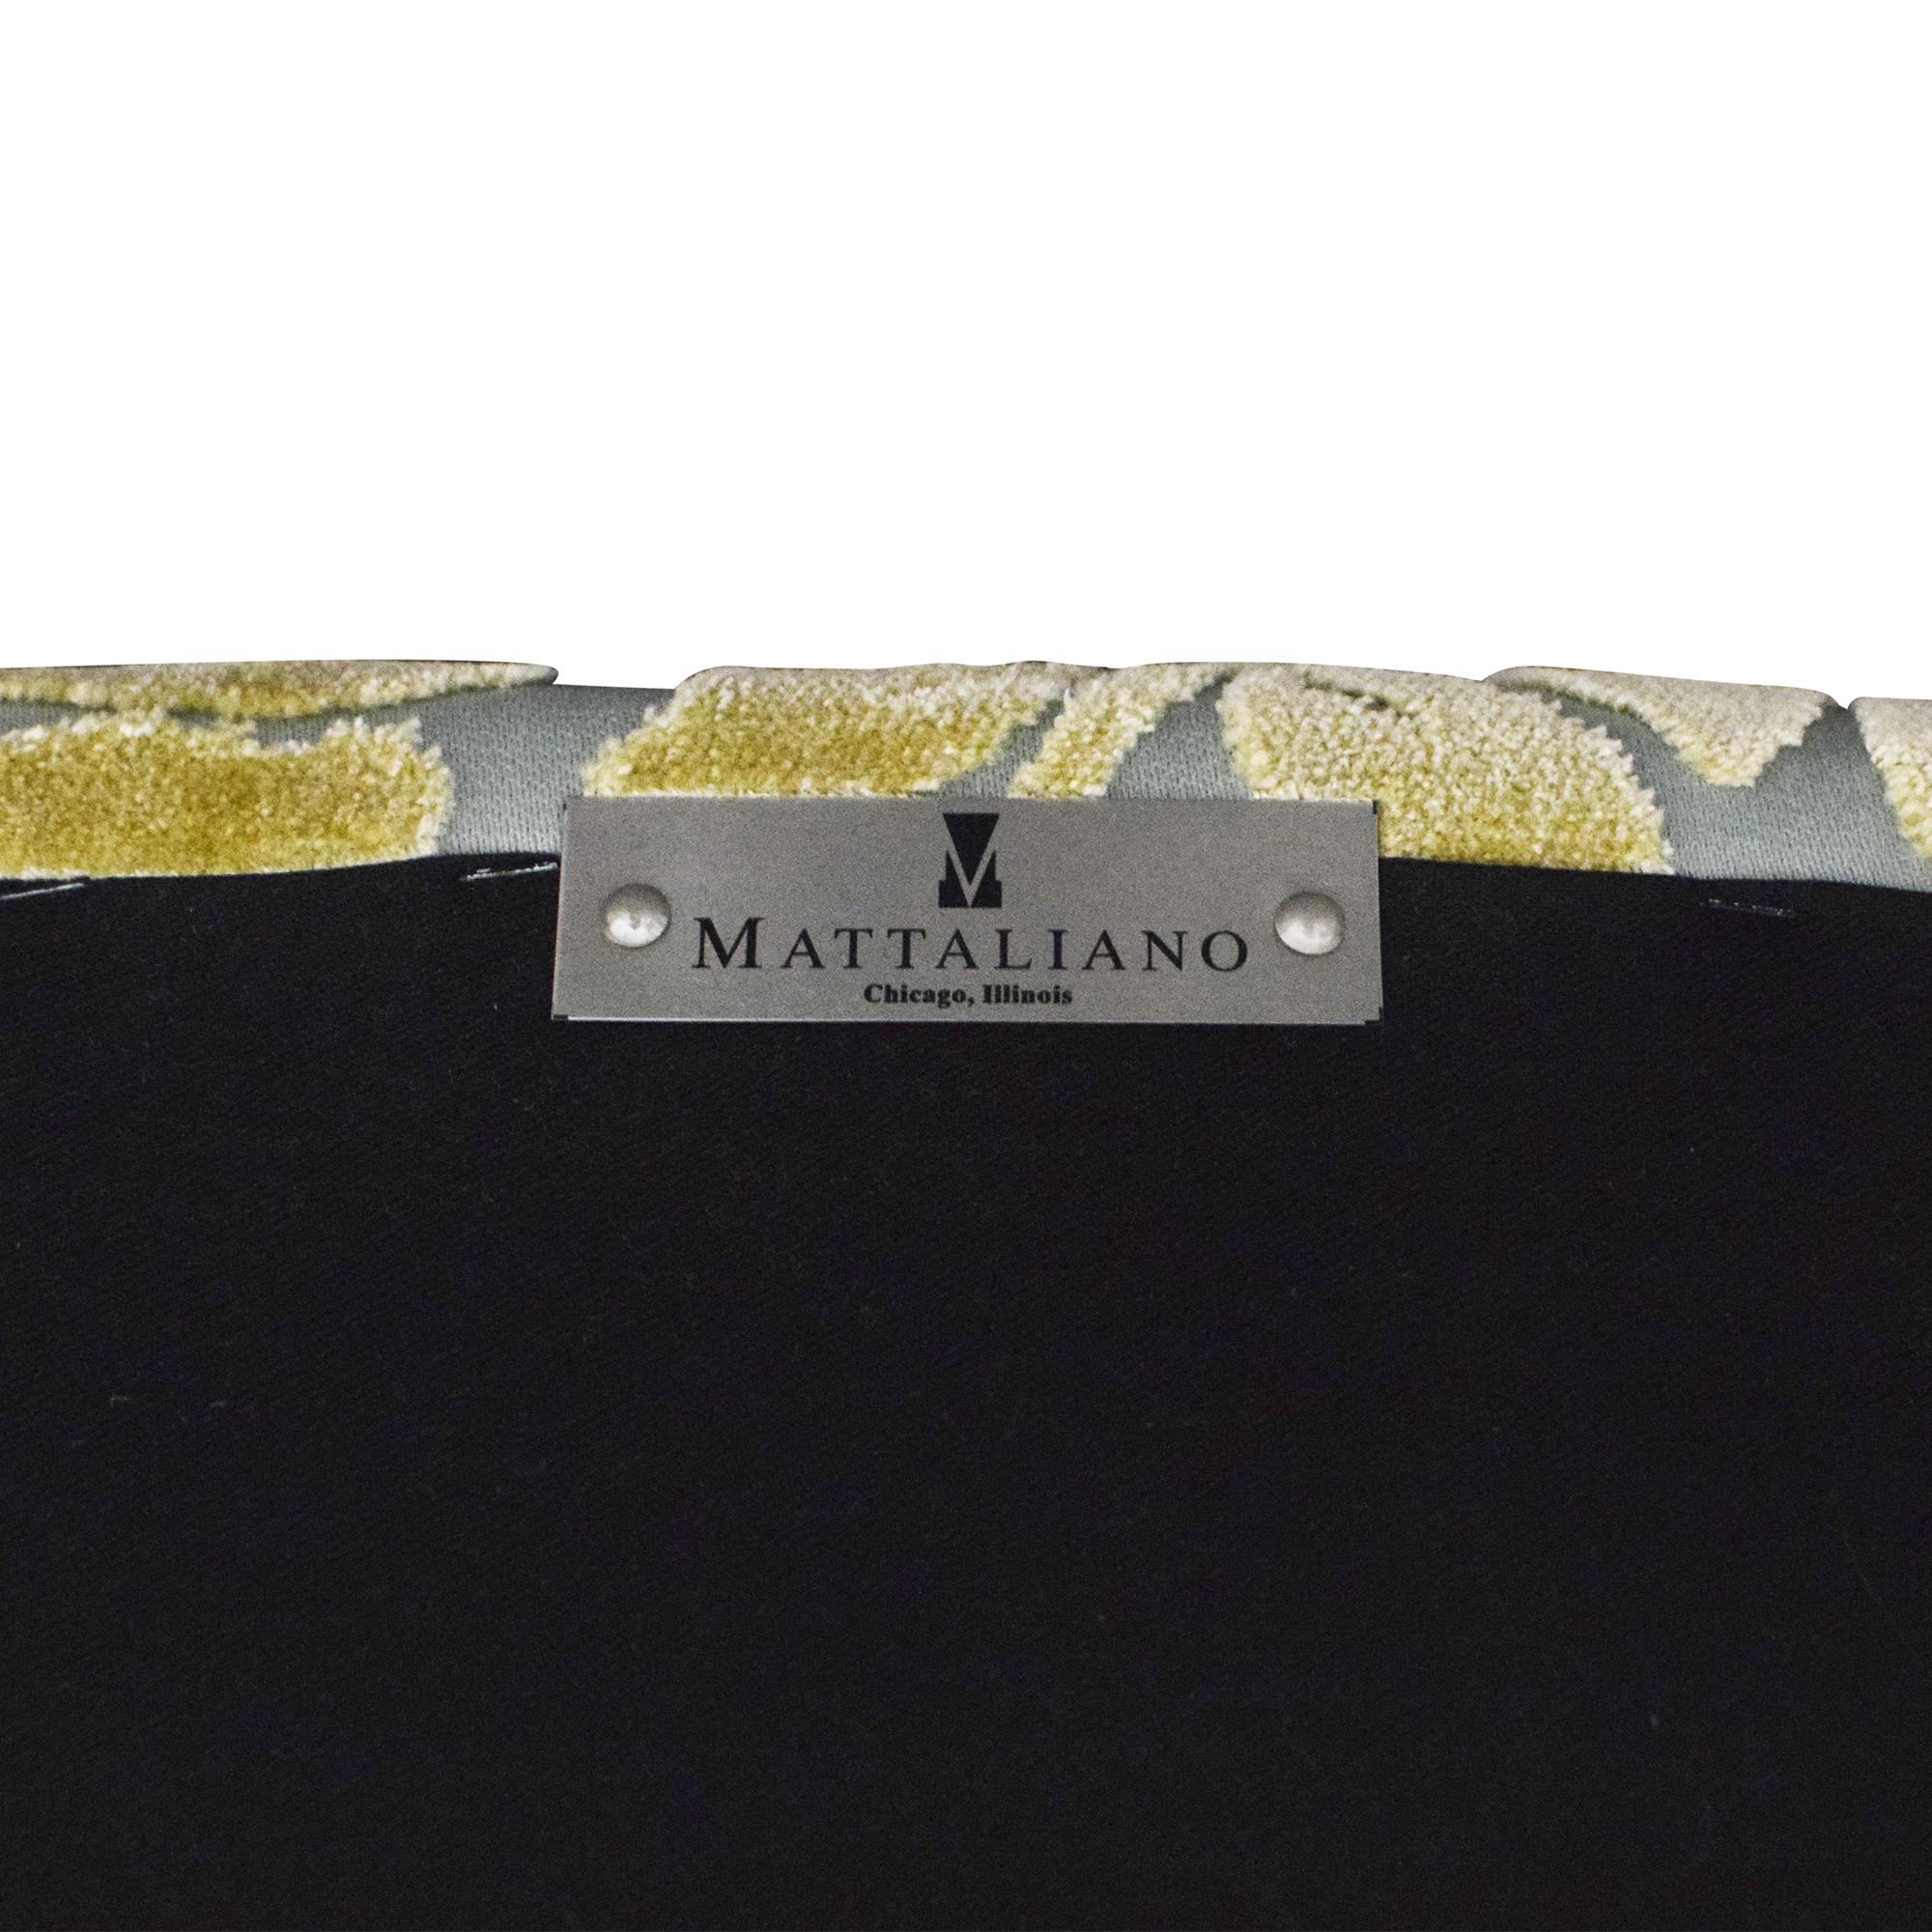 Mattaliano Flea Market #1 Dining Arm Chairs sale